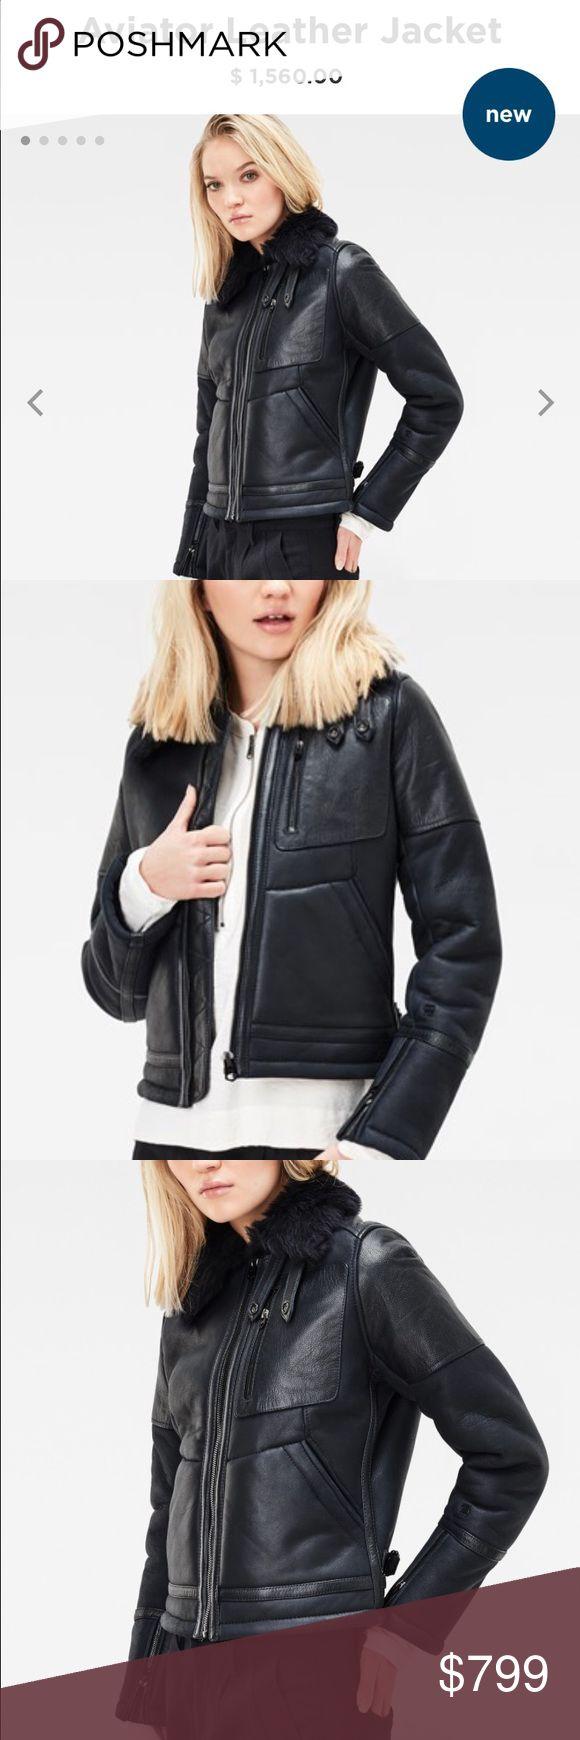 Top 25  best G star raw coats ideas on Pinterest | G star raw ...